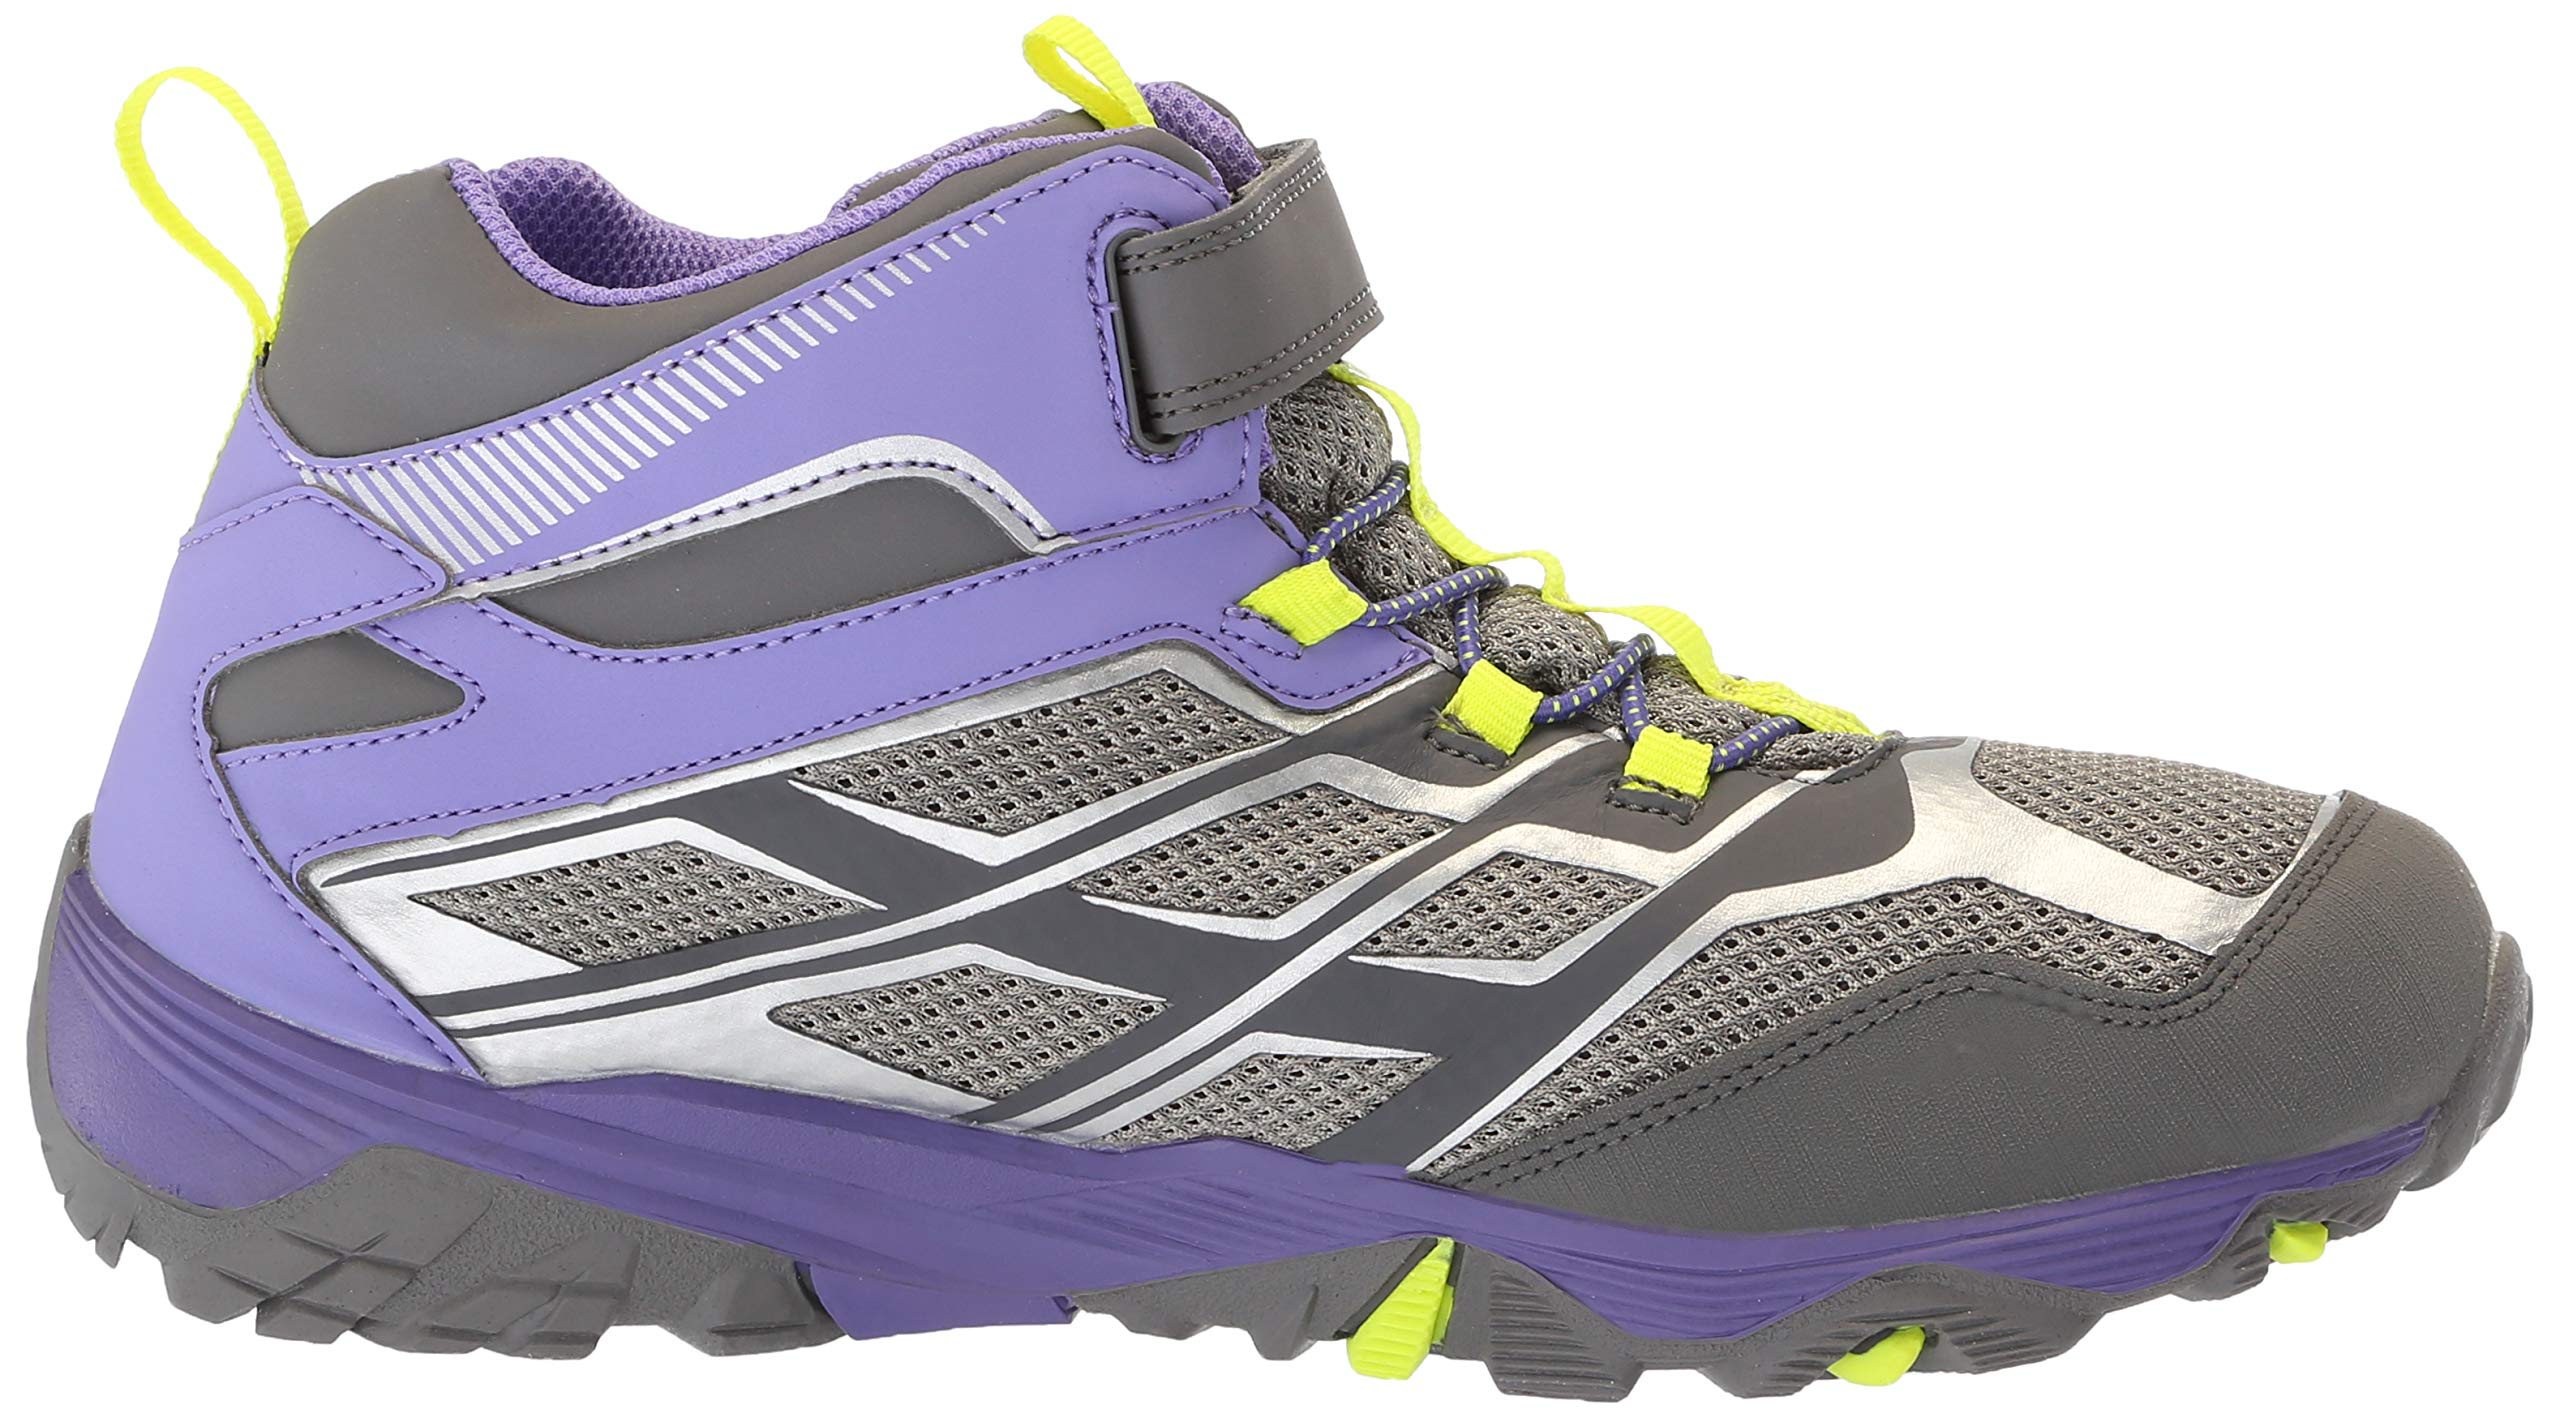 Merrell Girls' Moab FST Mid A/C WTRPF Hiking Shoe, Grey/Purple, 3.5 Medium US Big Kid by Merrell (Image #7)